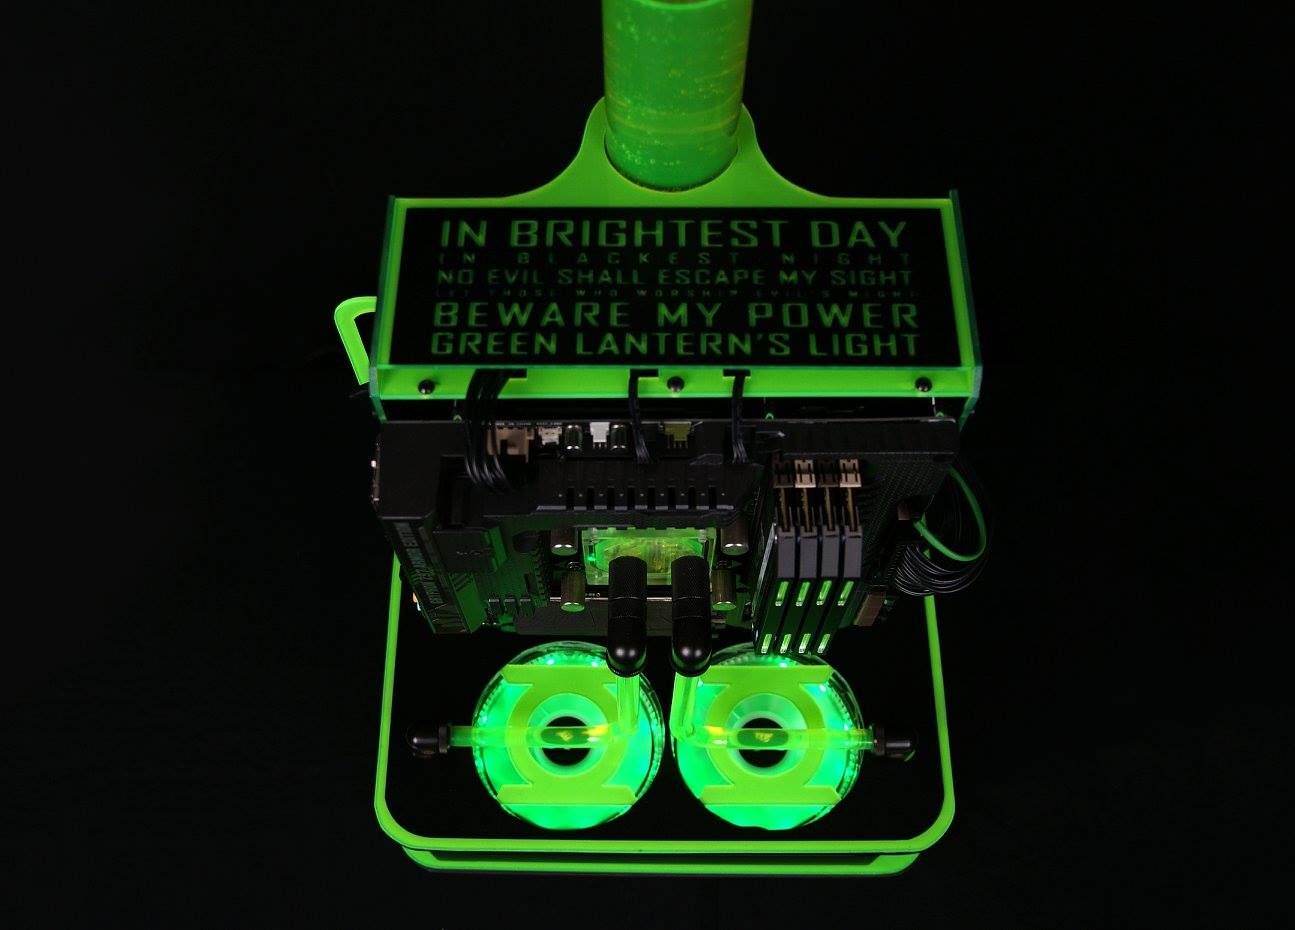 [MOD] Green Lantern par Richard Keirsgieter